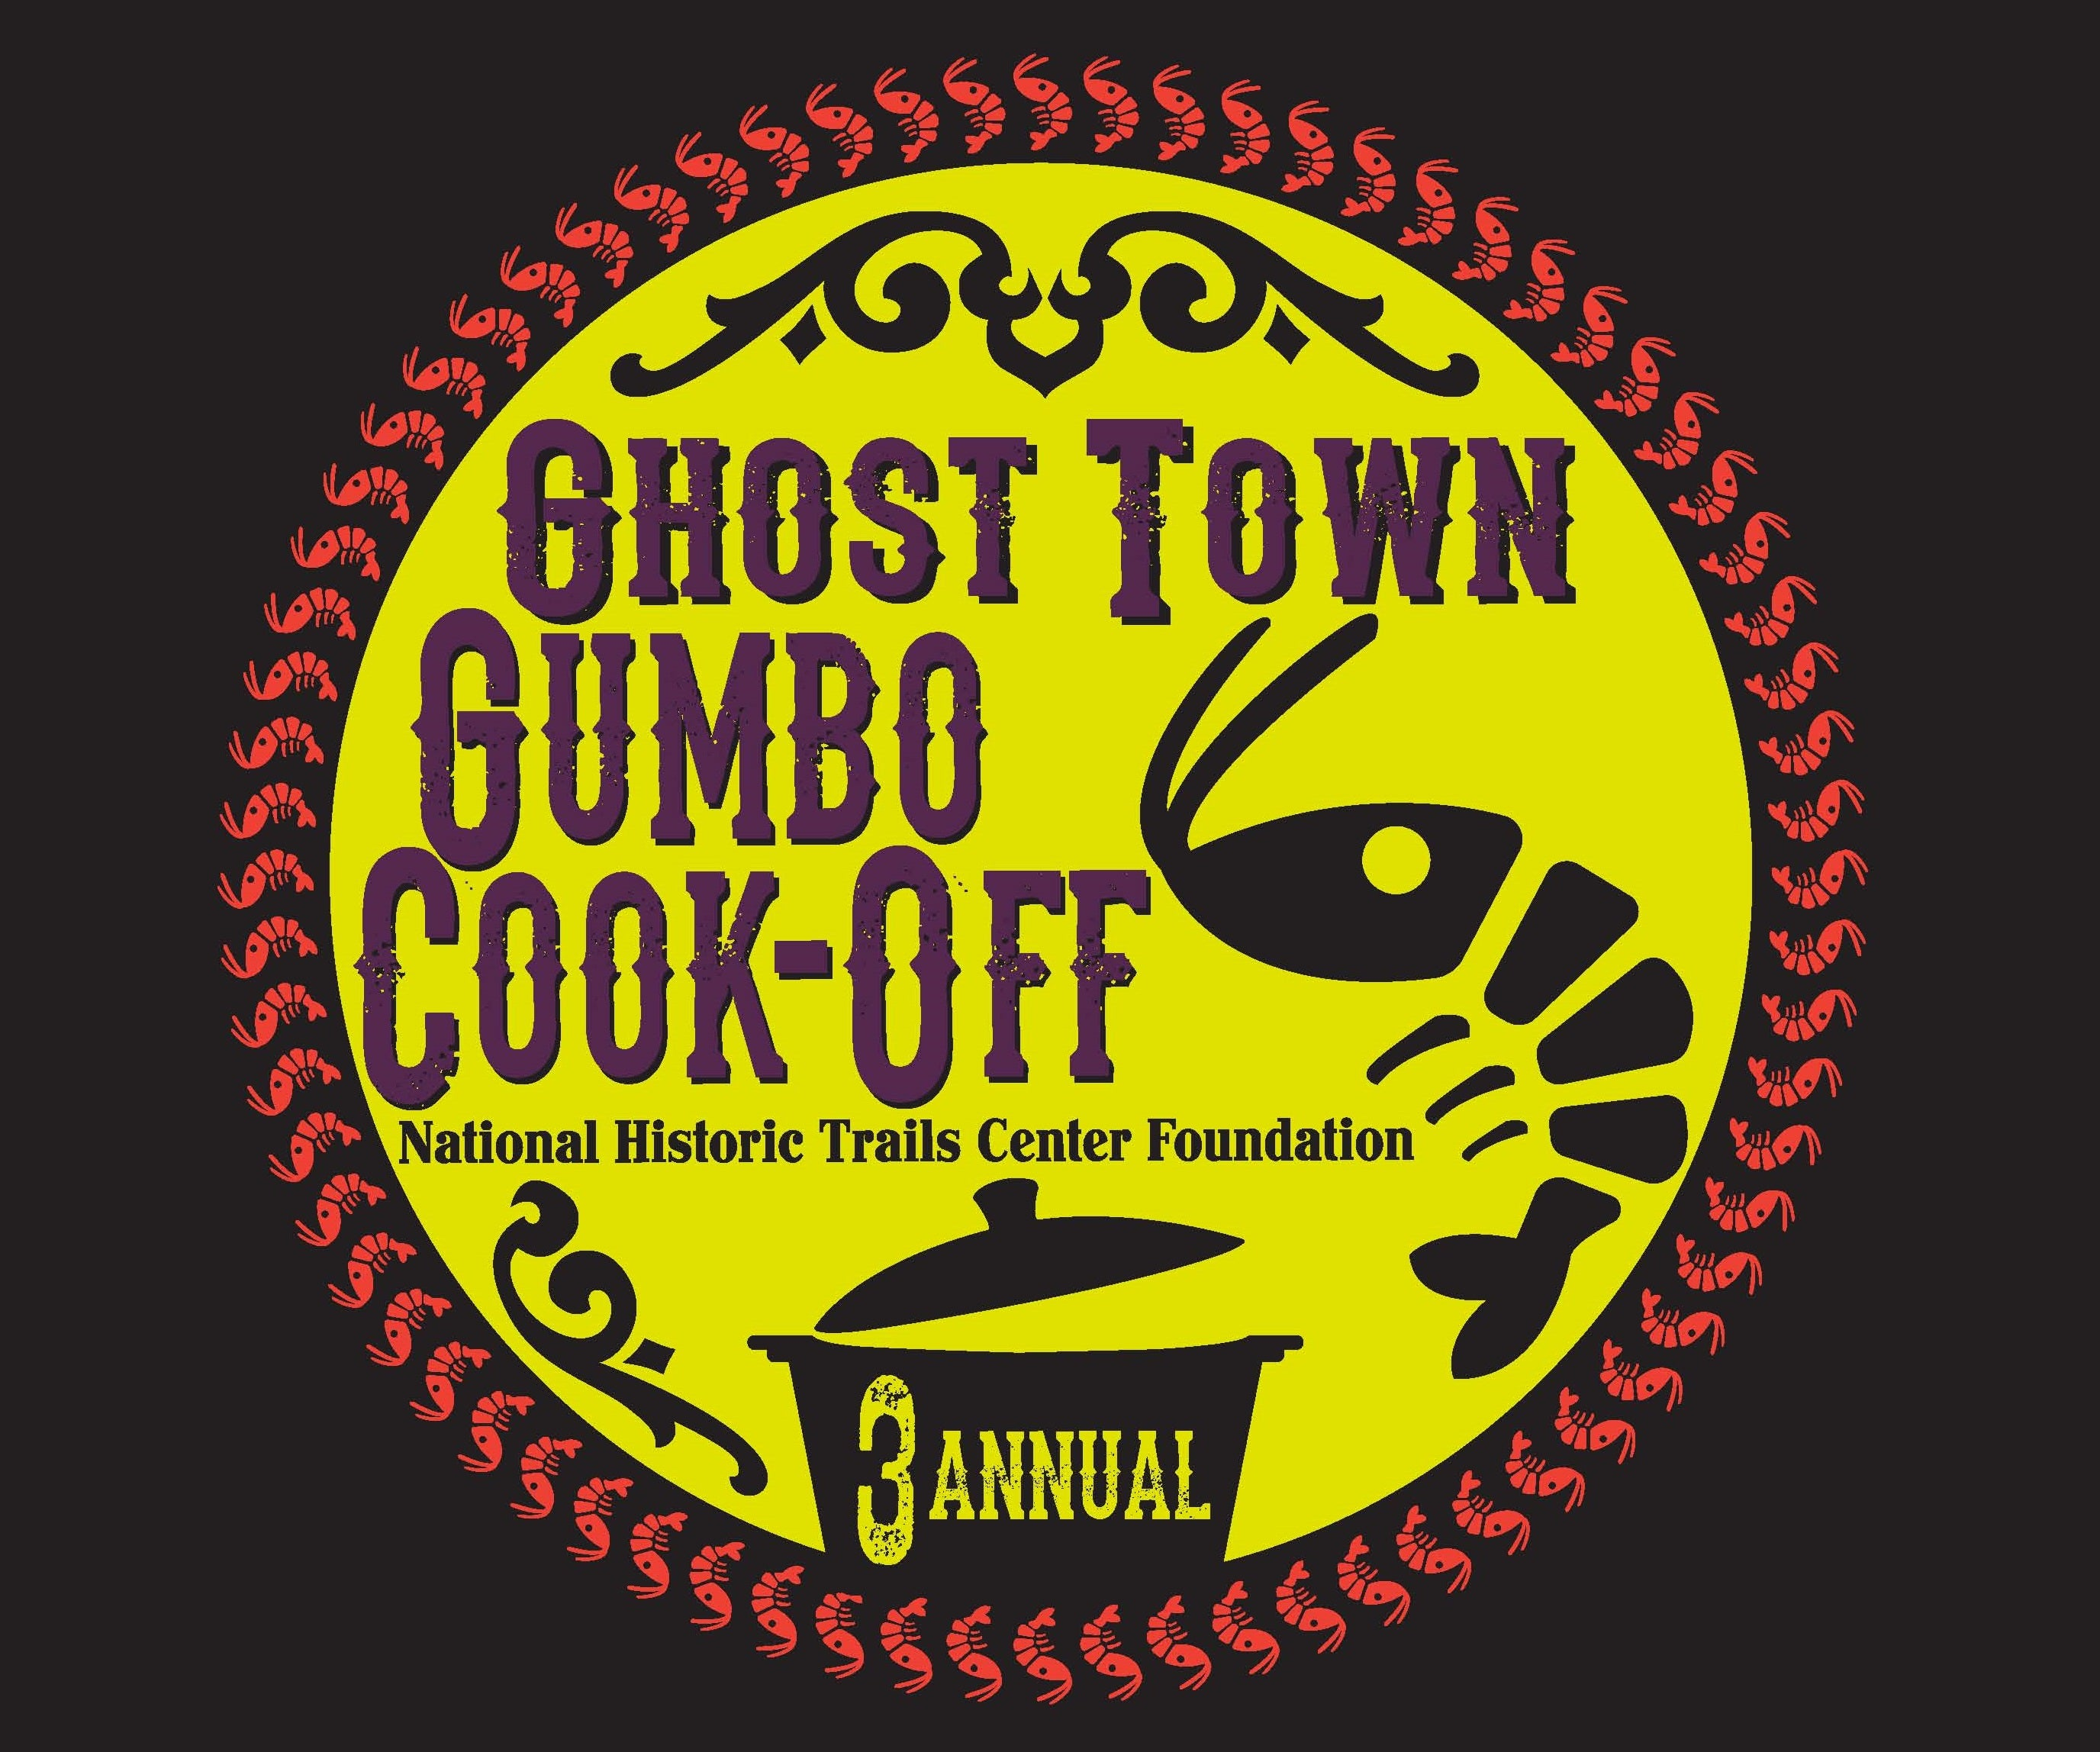 ghost town gumbo.jpg